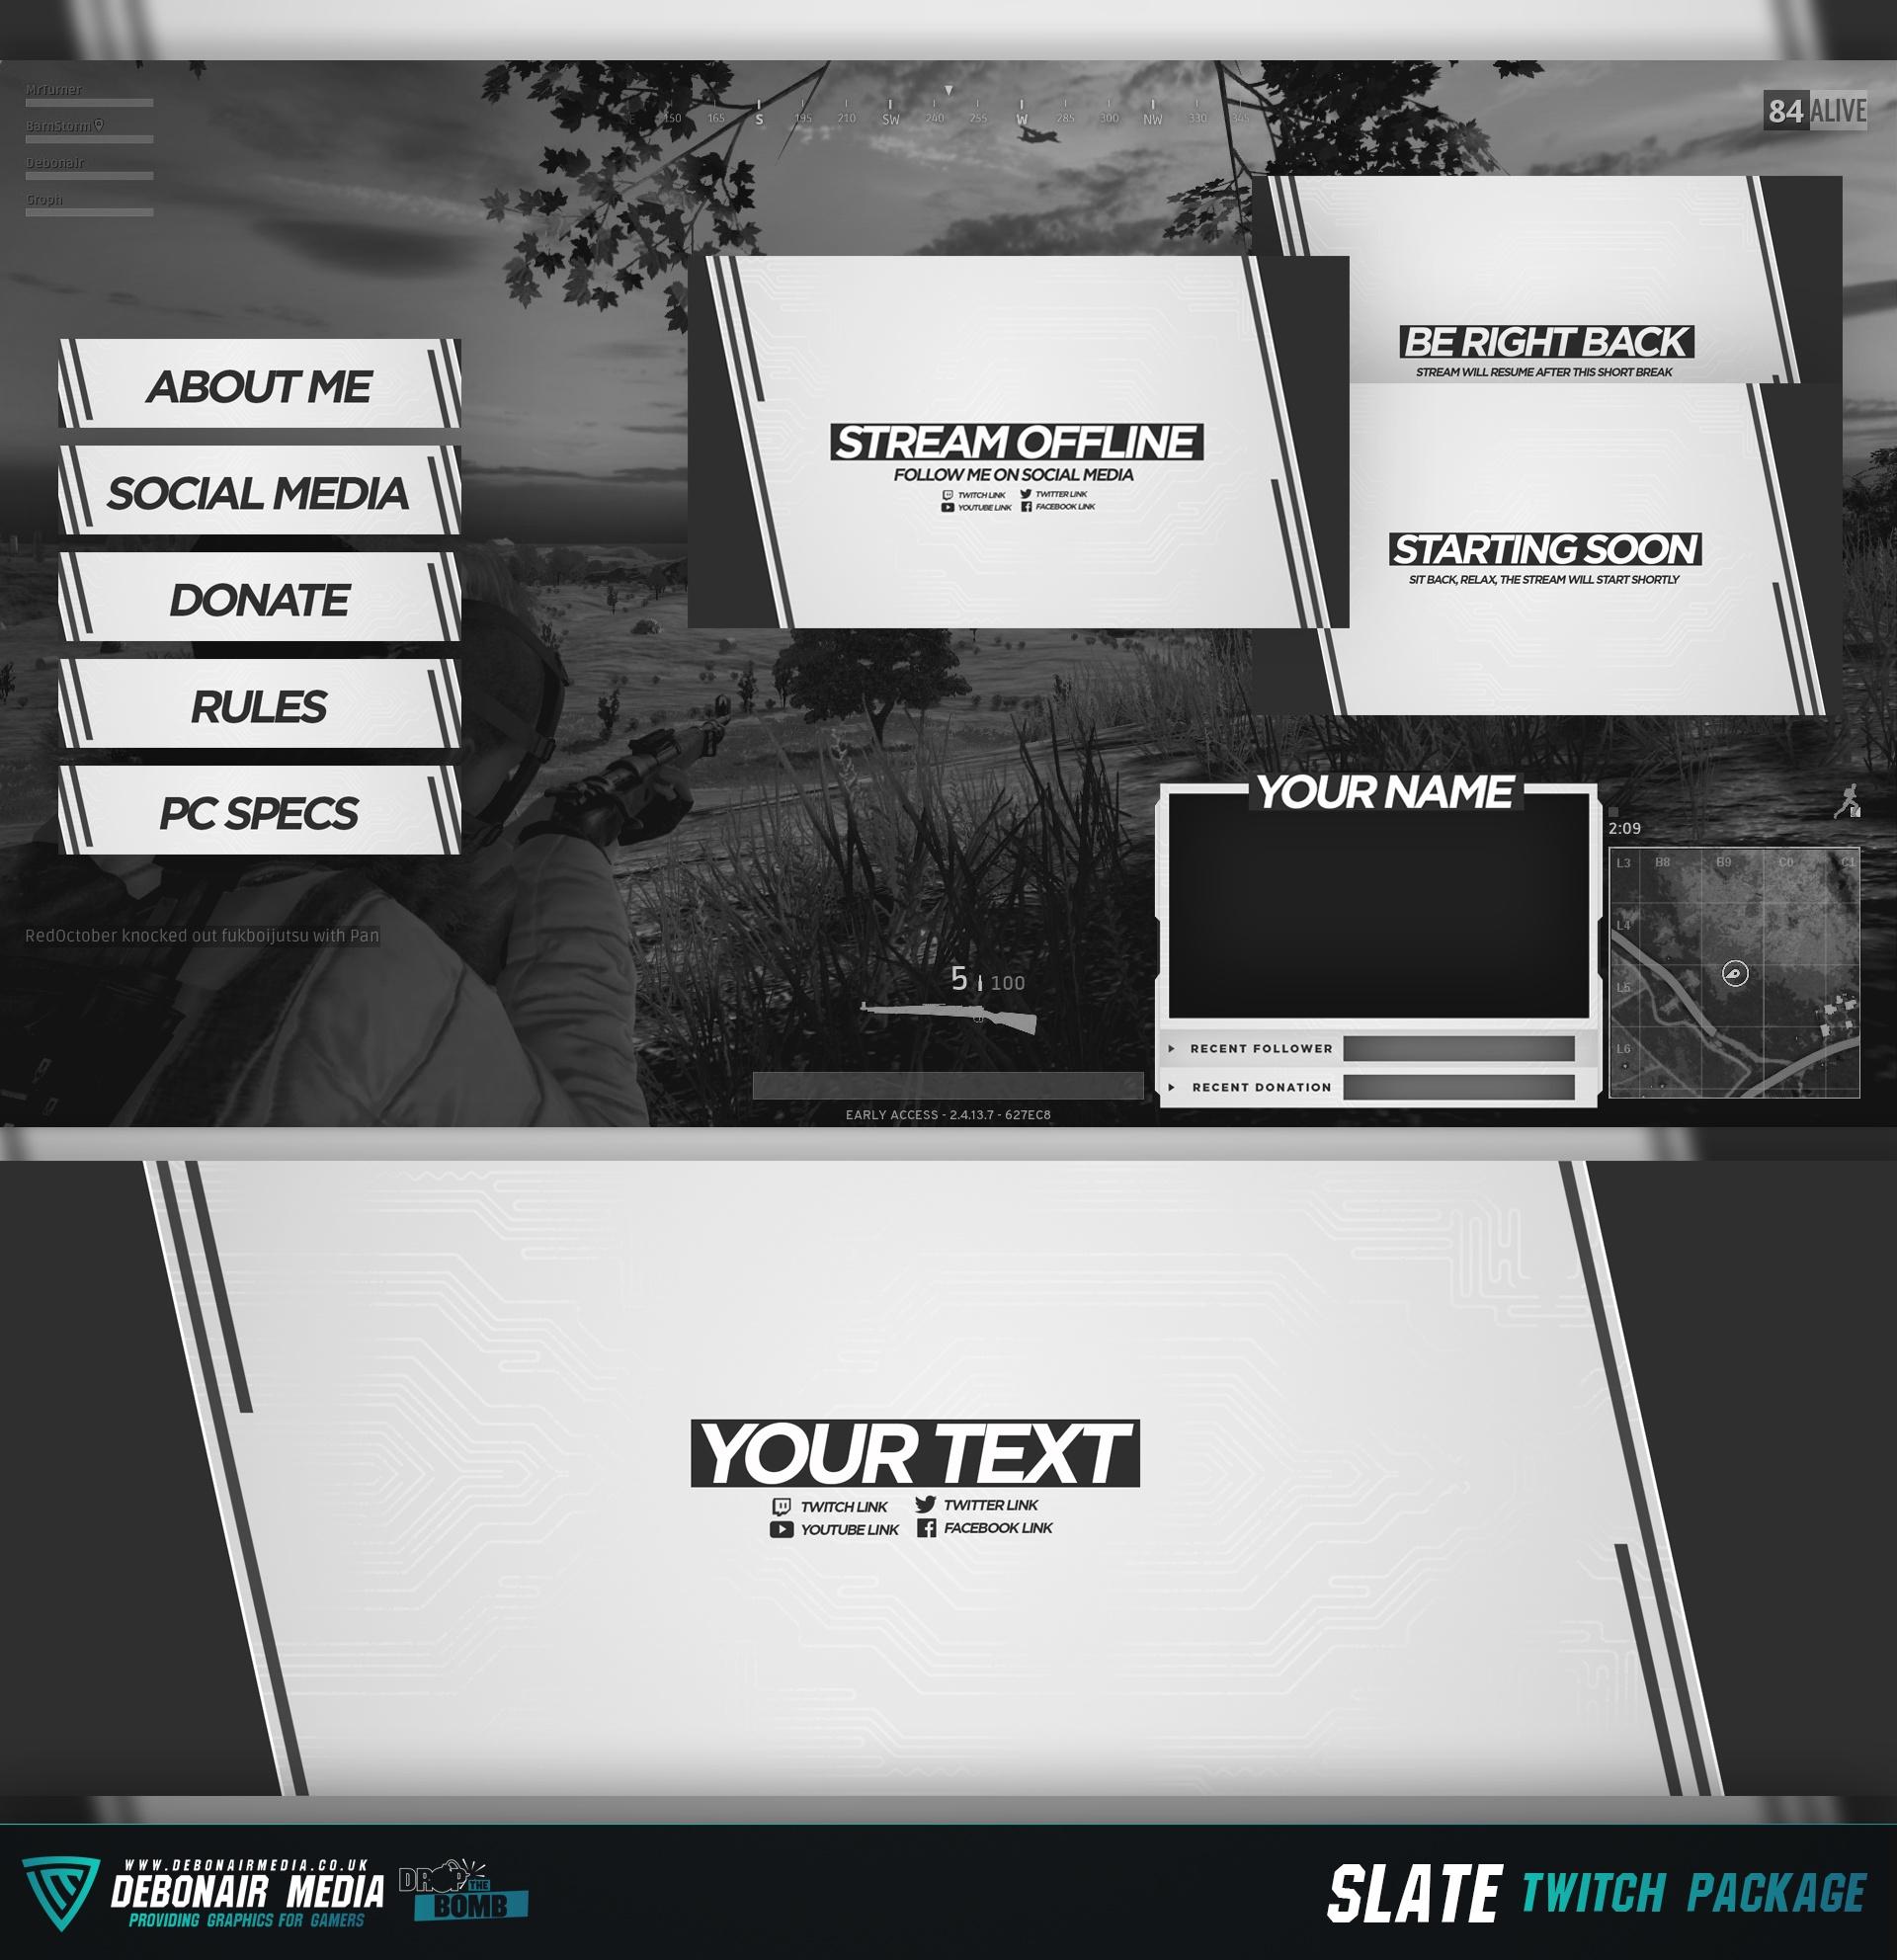 Slate - Twitch Streamer Package